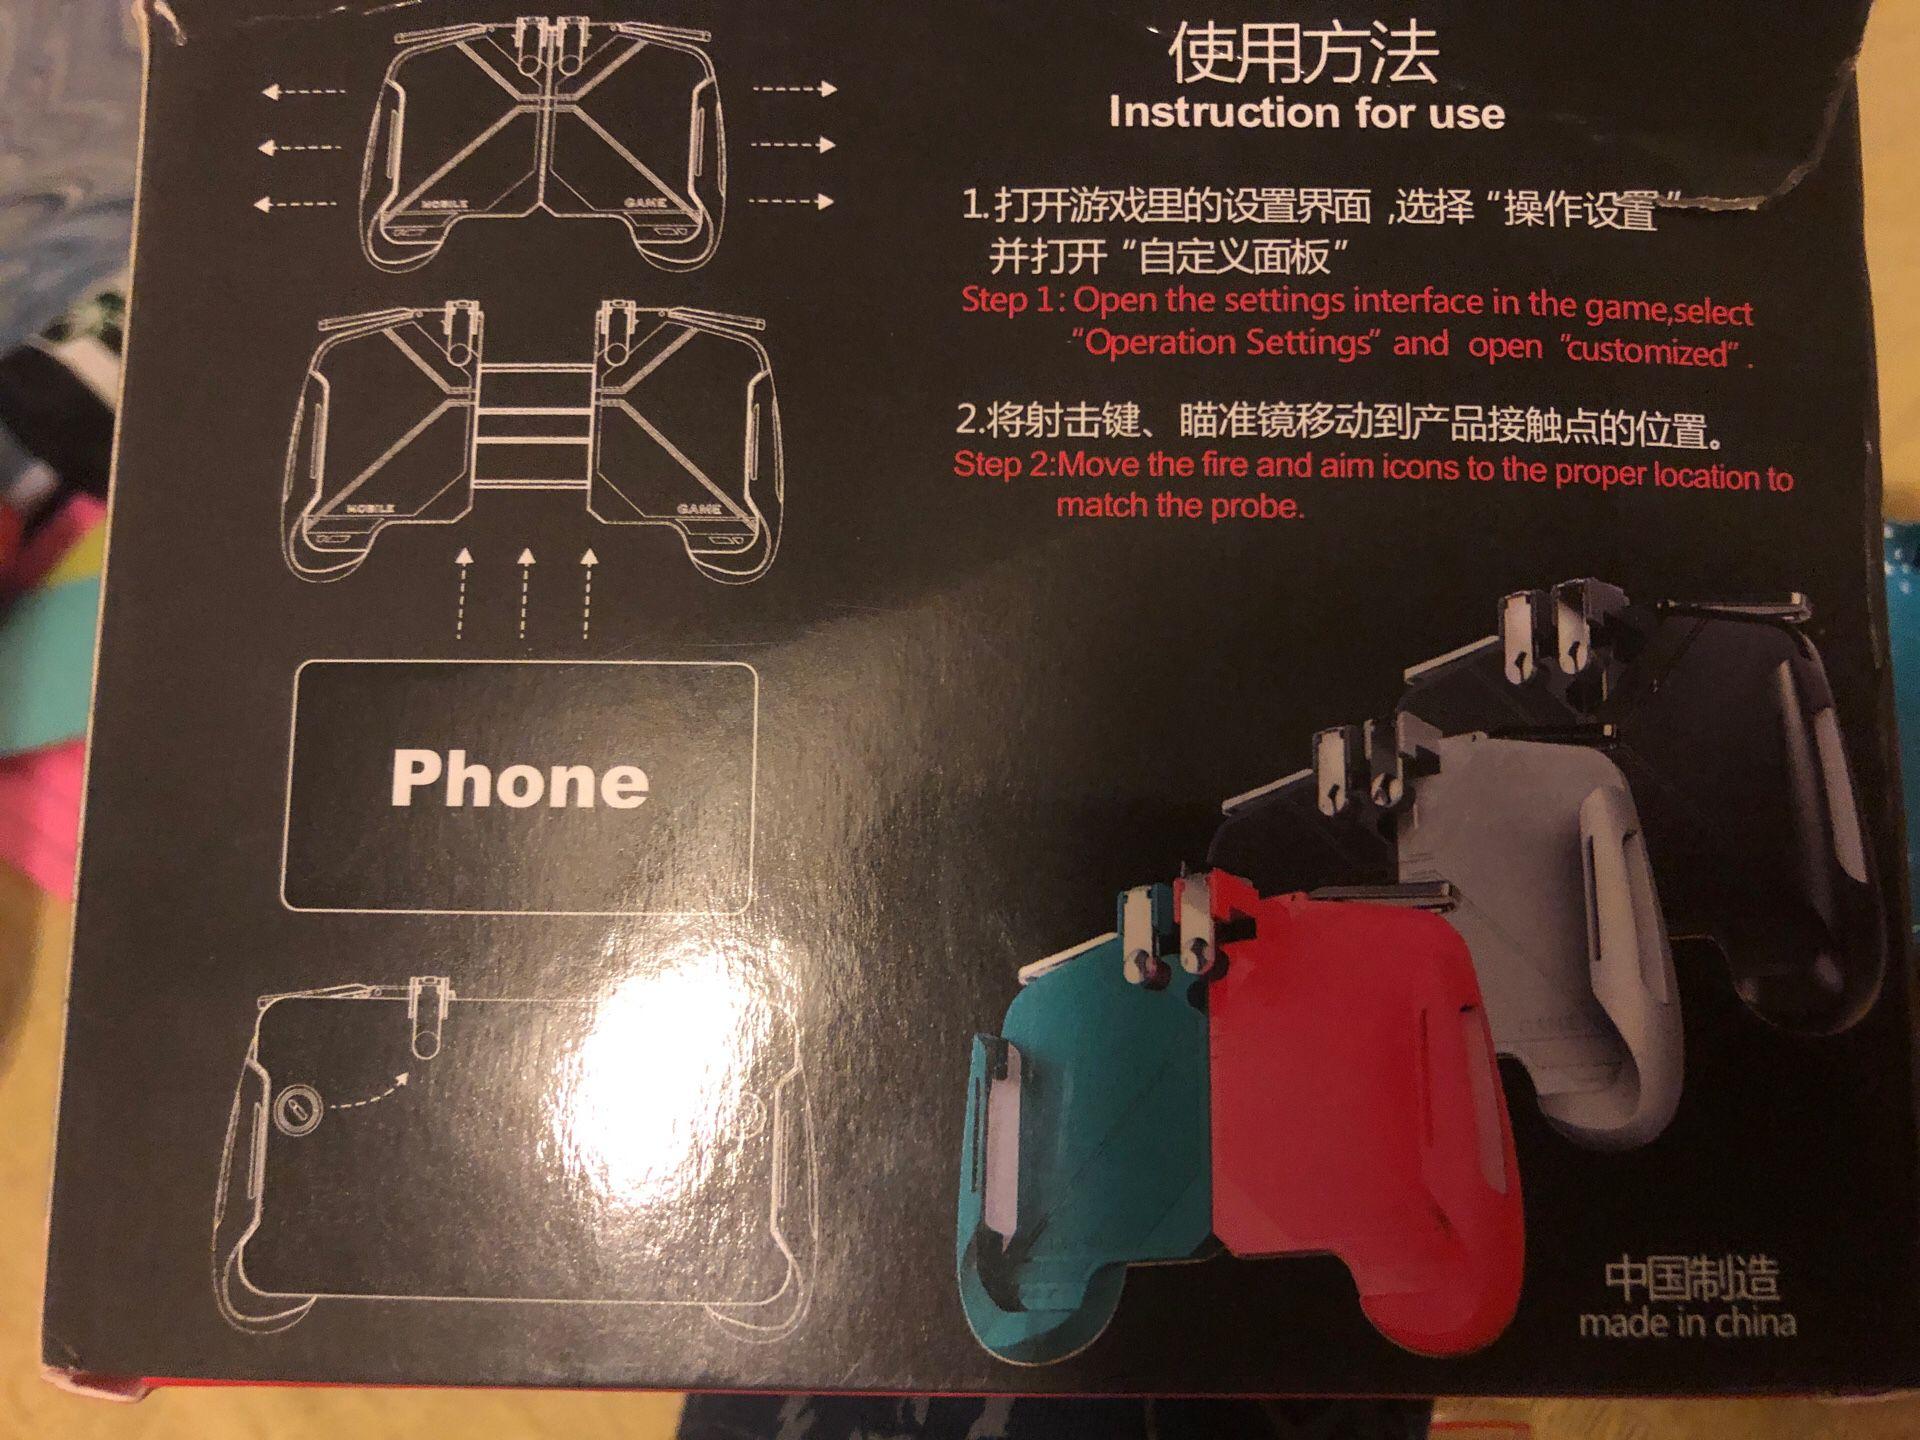 Phone controller